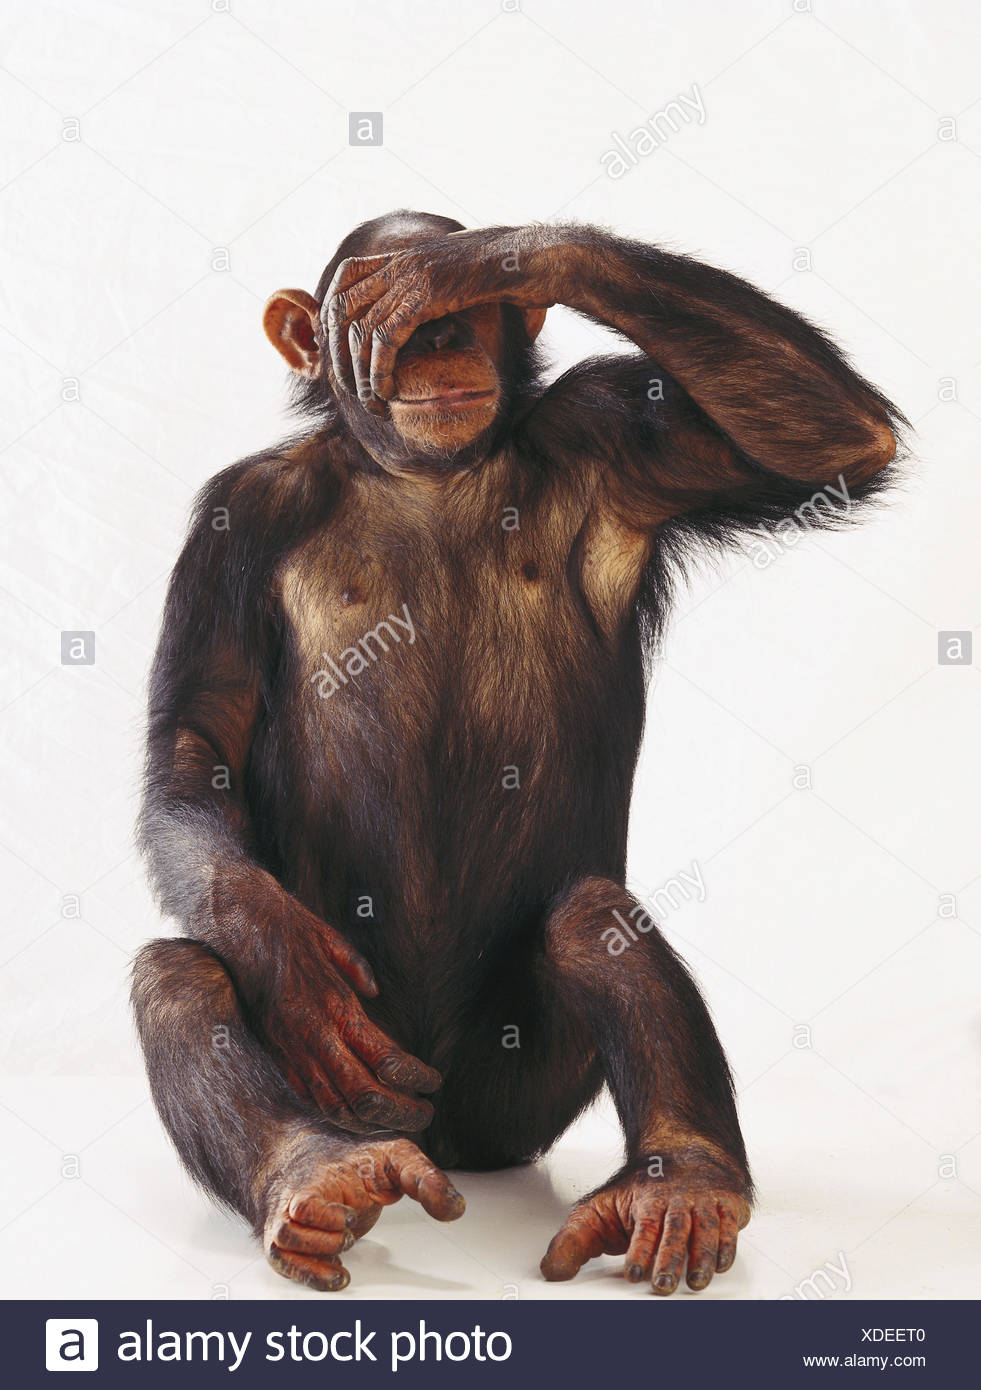 Chimpanzee, Pan troglodytes, gesture, 'nothing see' mammals, mammal, wild animals, wild animal, monkey, Lord's animals, primate, primates, big apes, ape, sit, eyes keep closed, studio - Stock Image